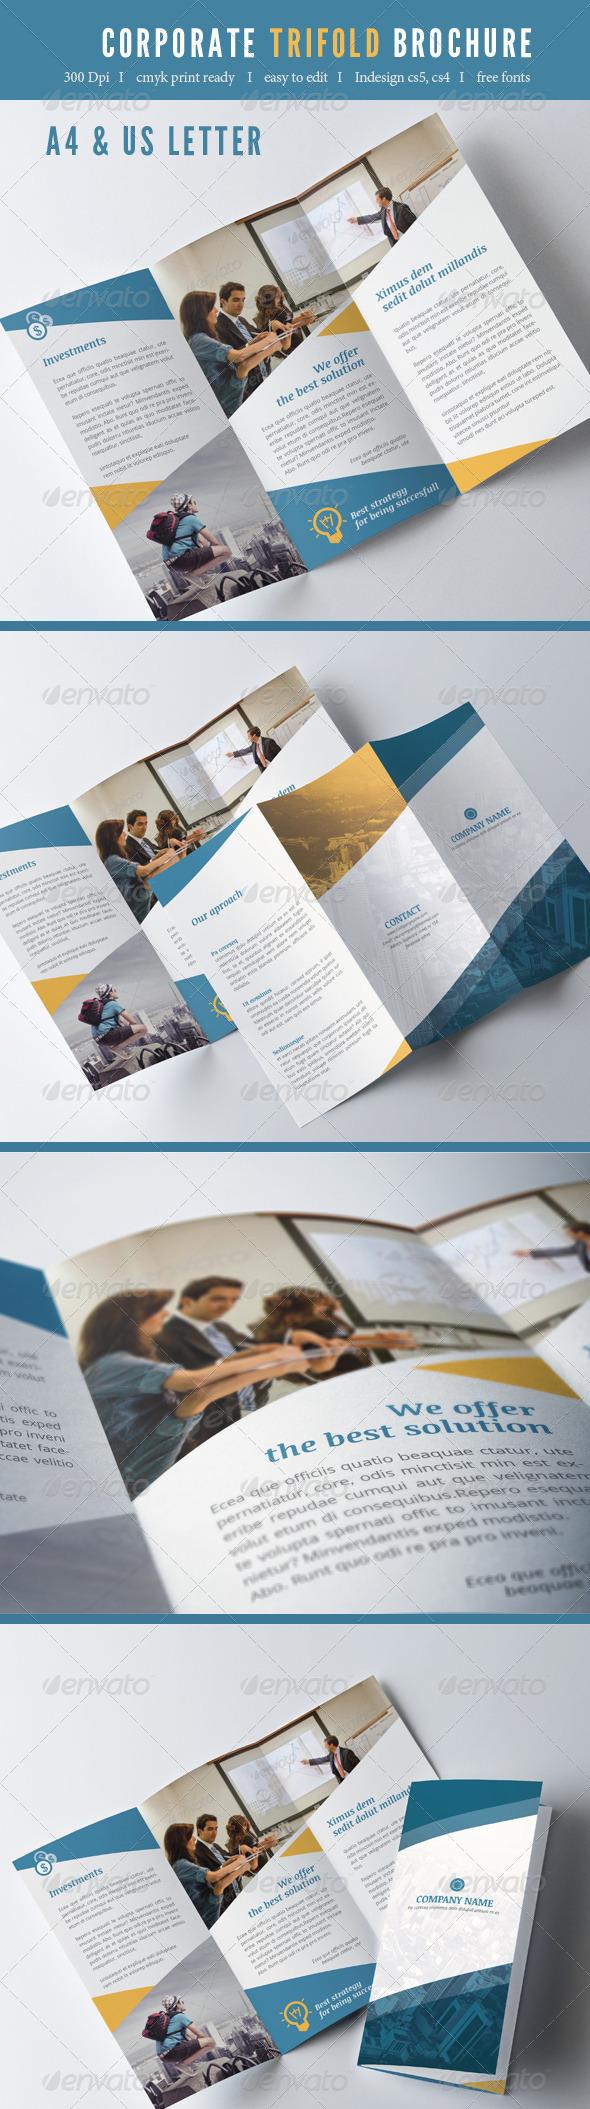 GraphicRiver Trifold Brochure 7821169